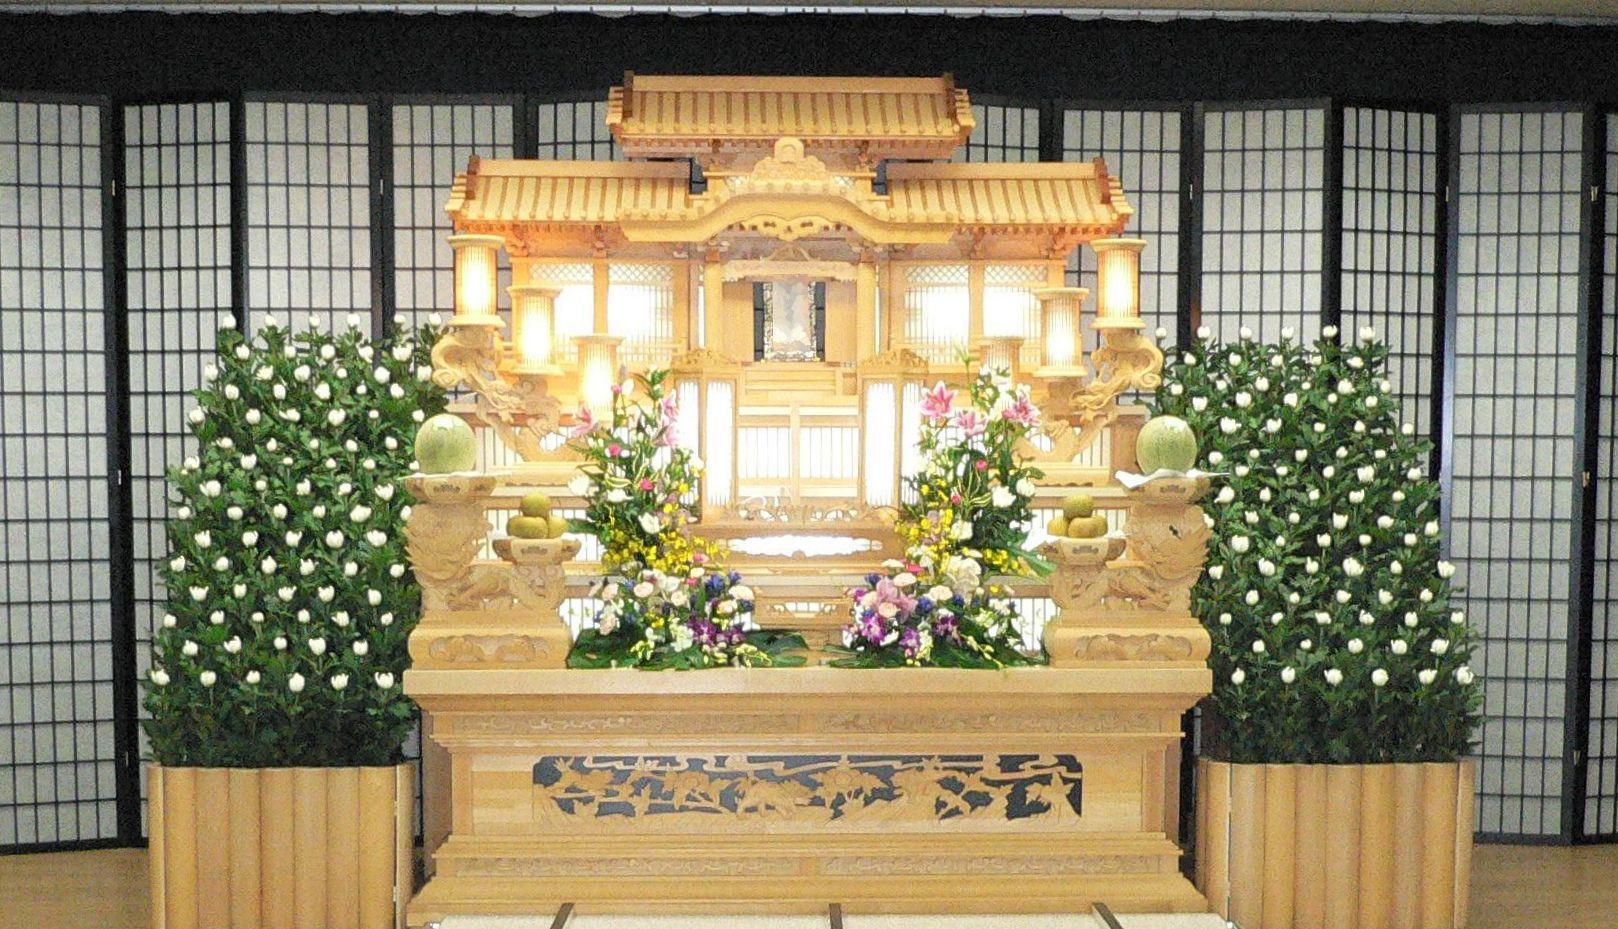 2F1-2 白木祭壇 スロープ付き